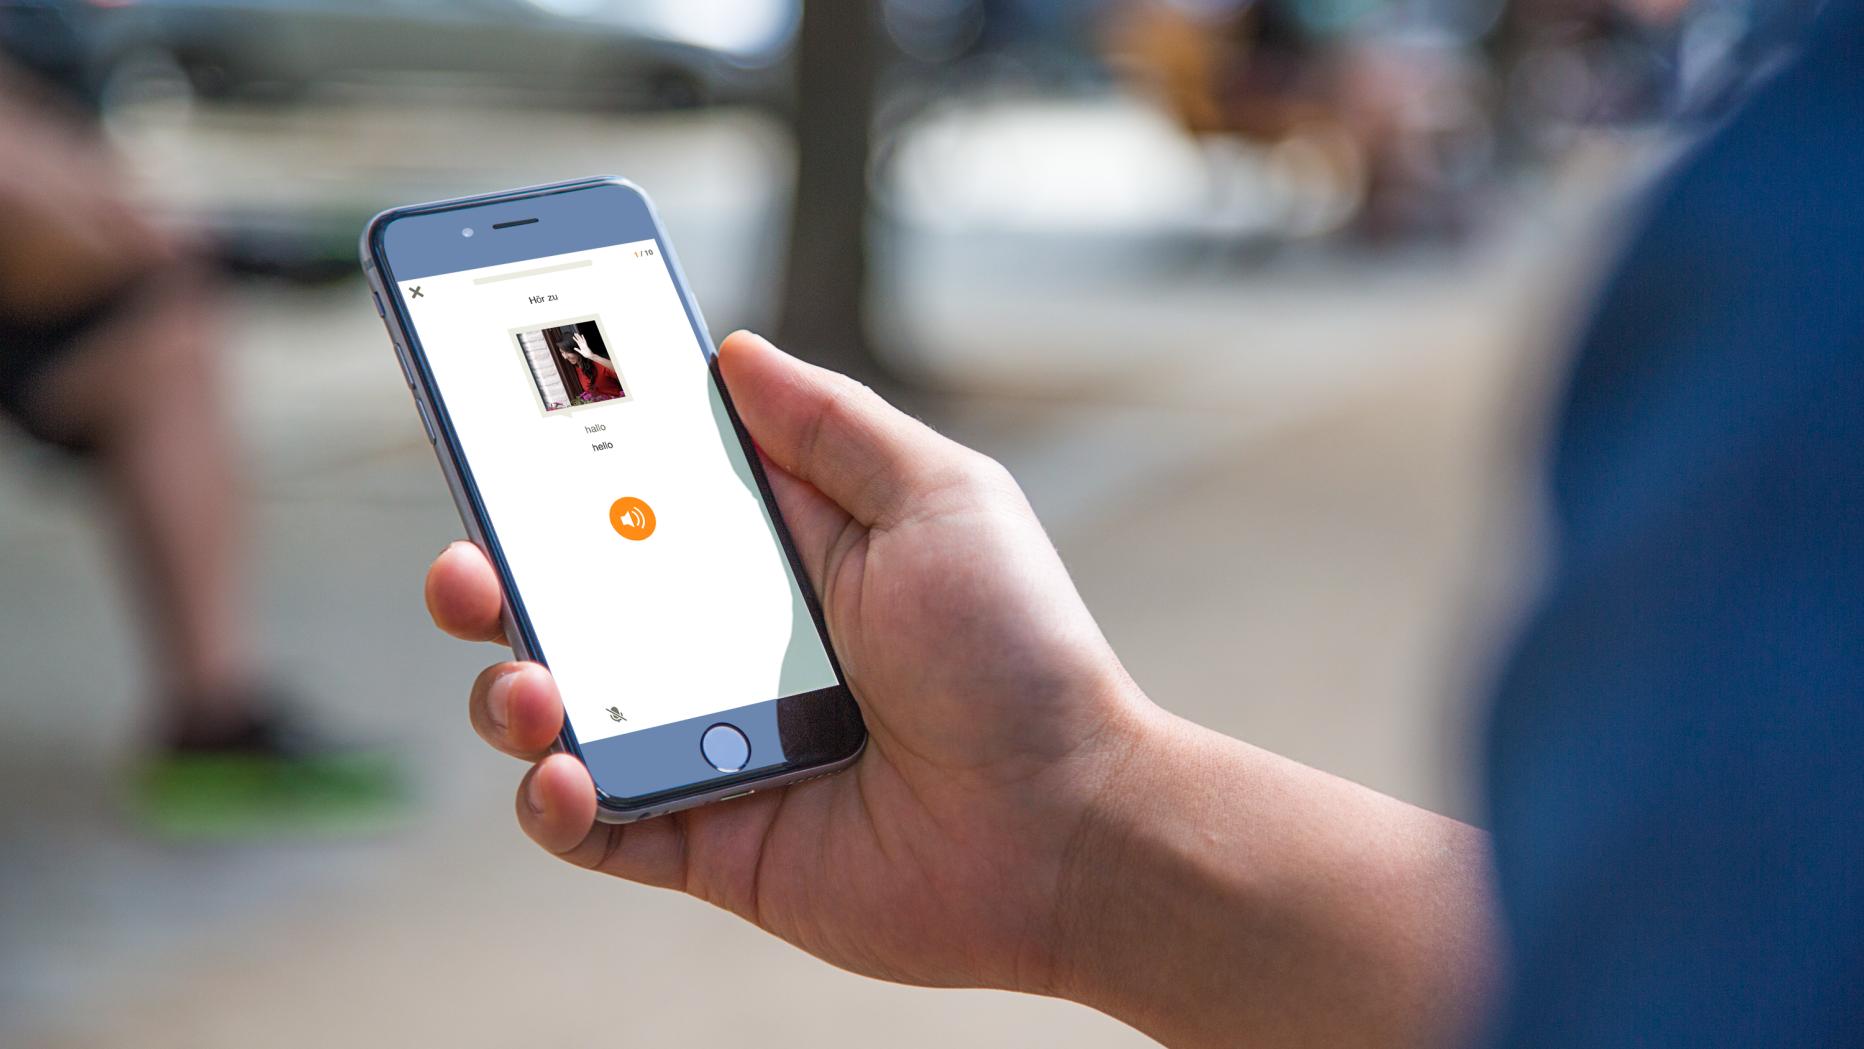 app italienisch lernen android kostenlos